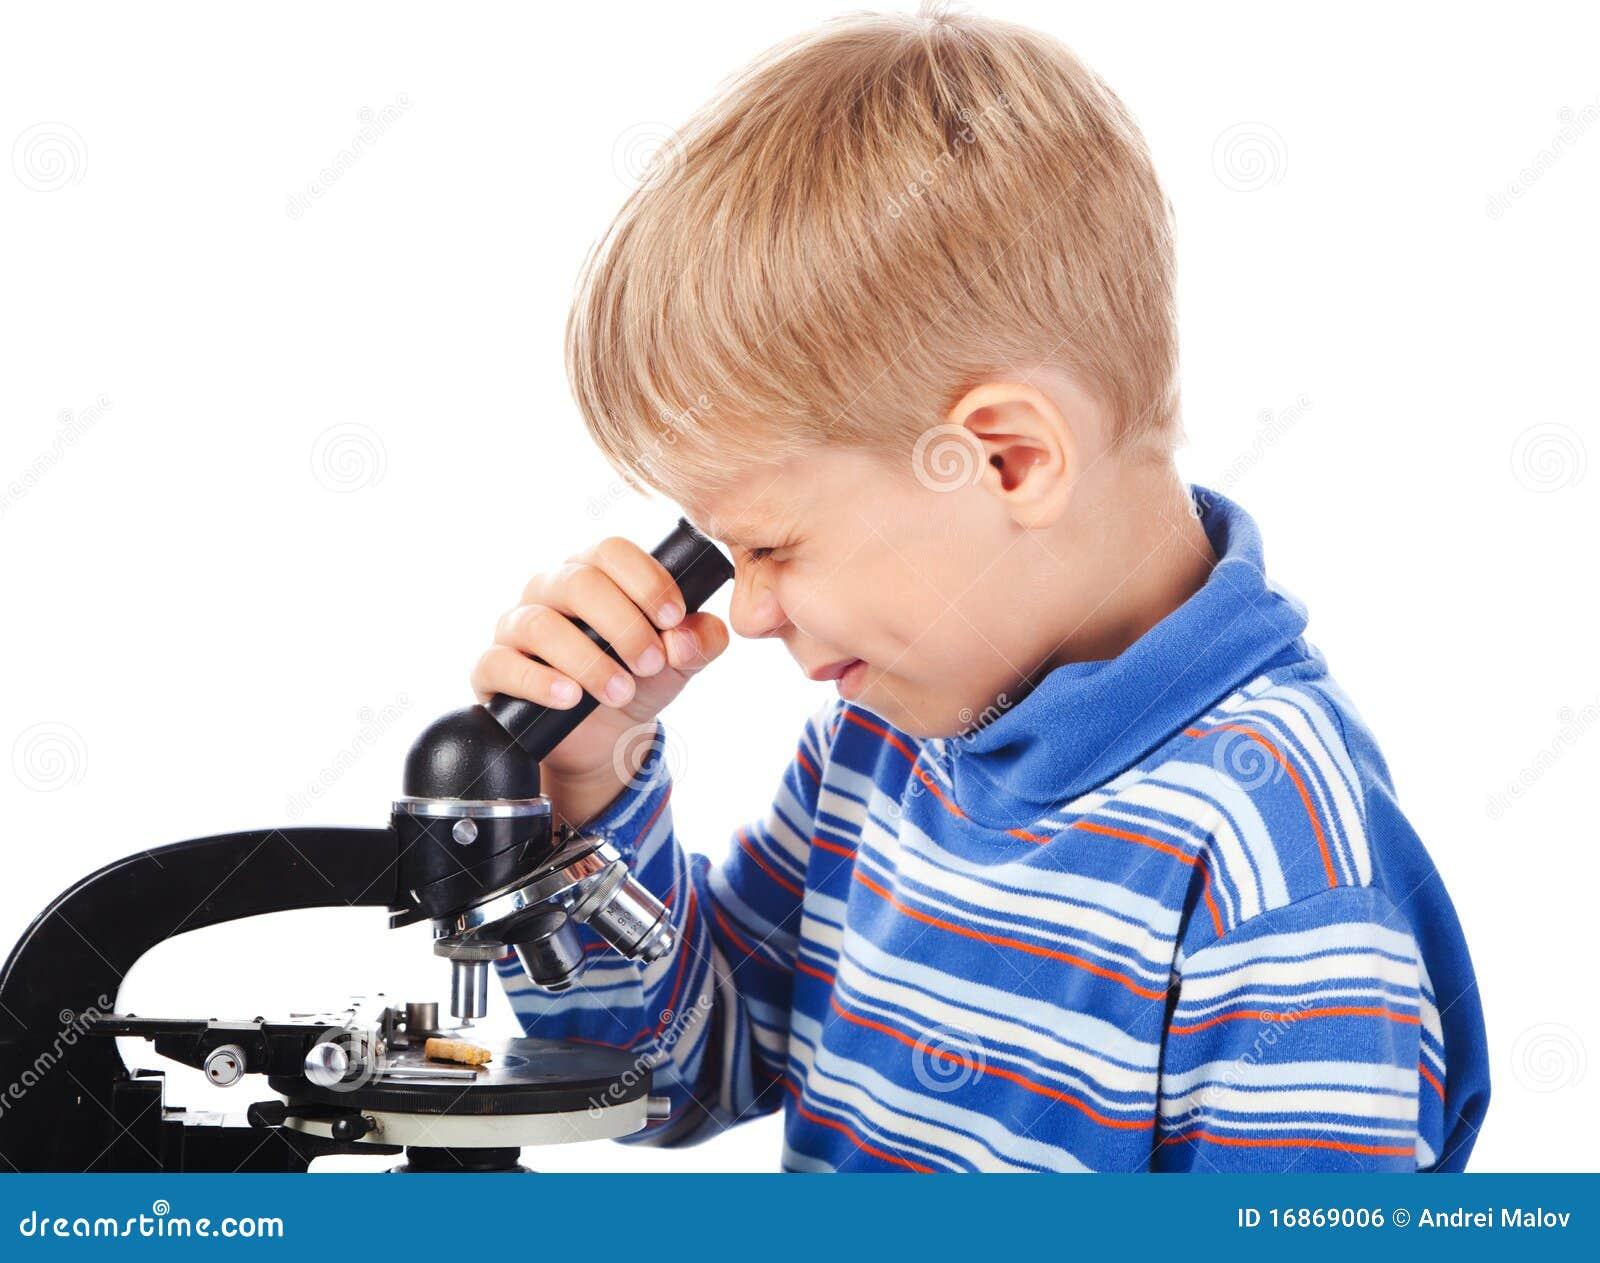 Cinco anos de menino idoso com microscópio